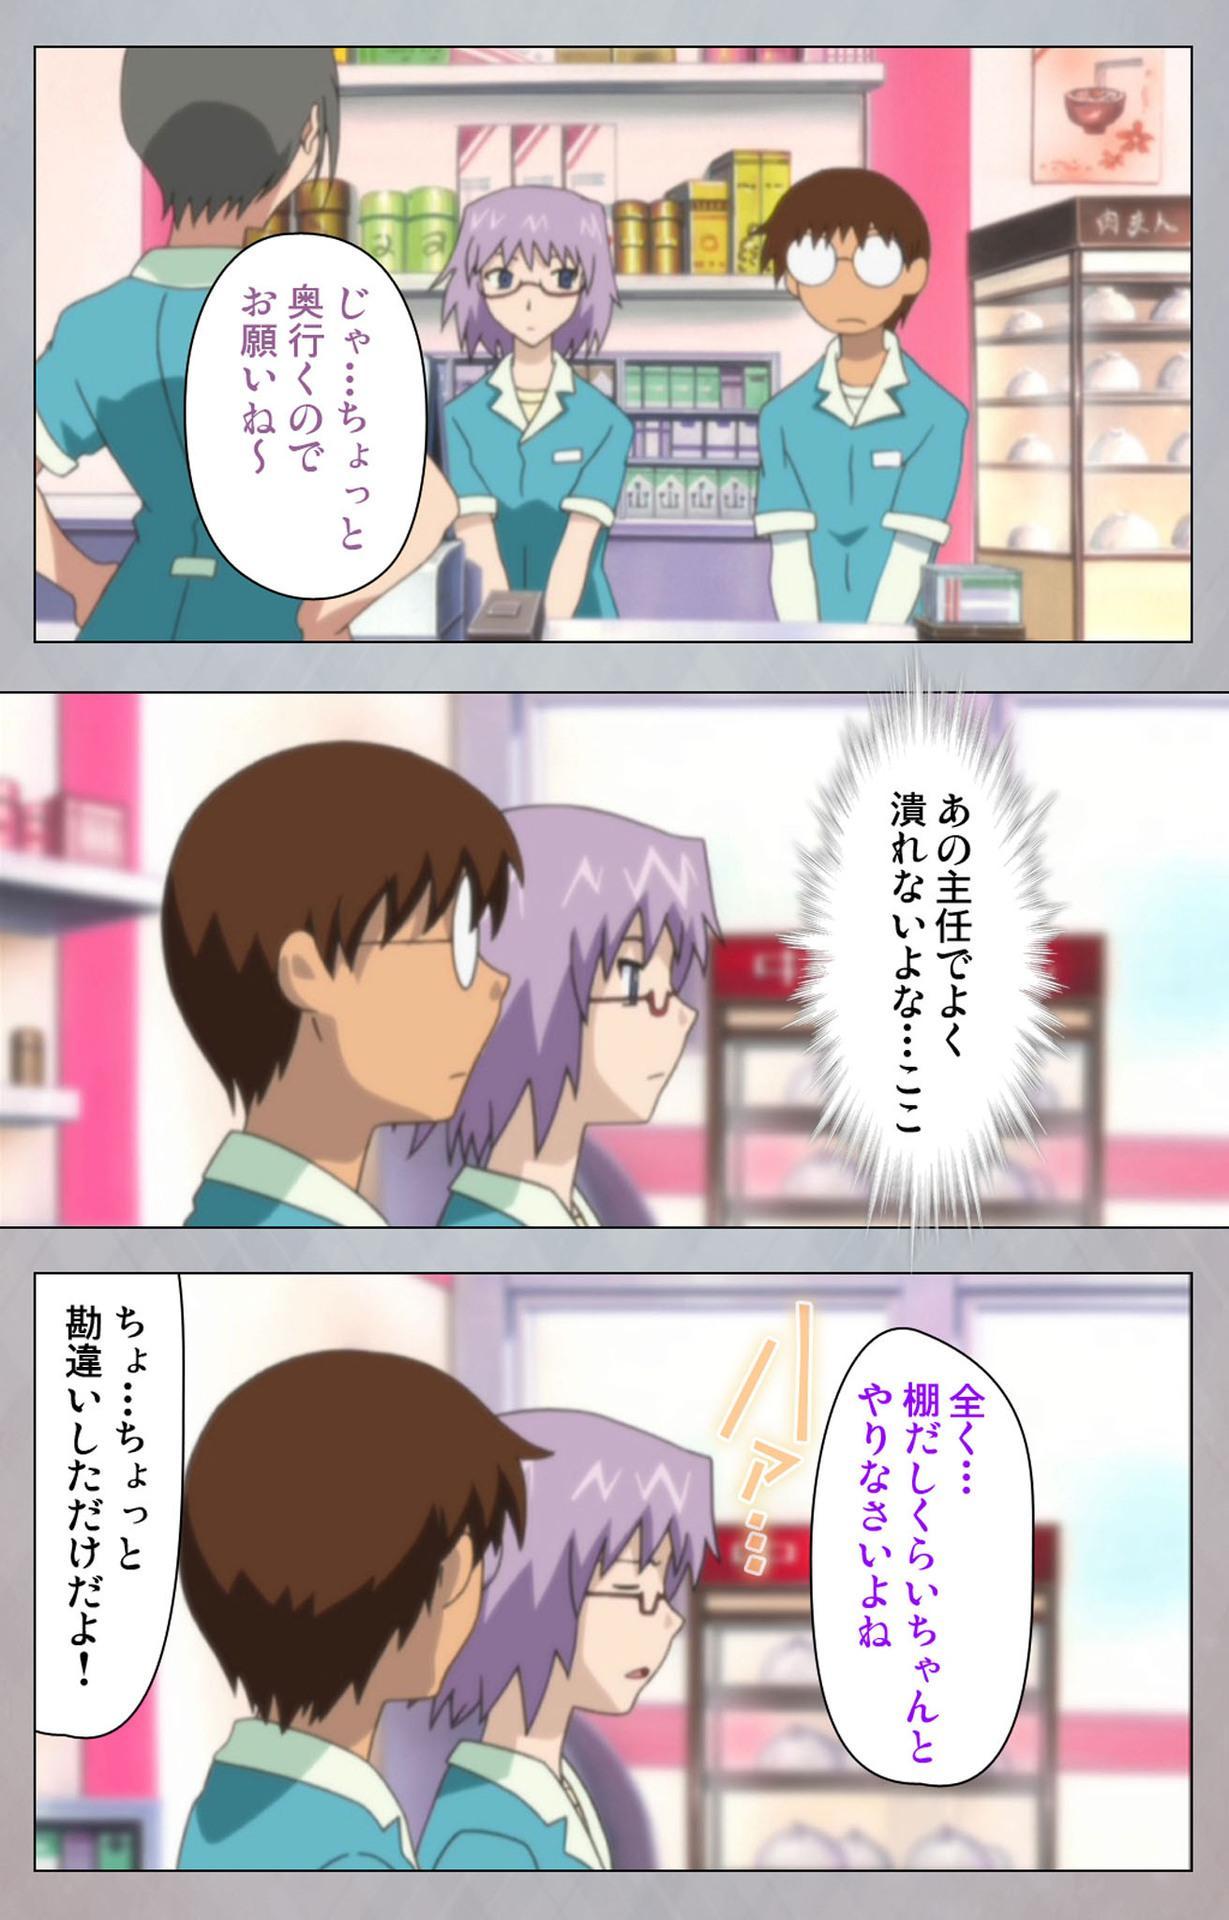 [Digital Works] [Full Color Seijin Ban] Sex Android ~Risou no Onna de Nuite yaru~ Kanzenban 7